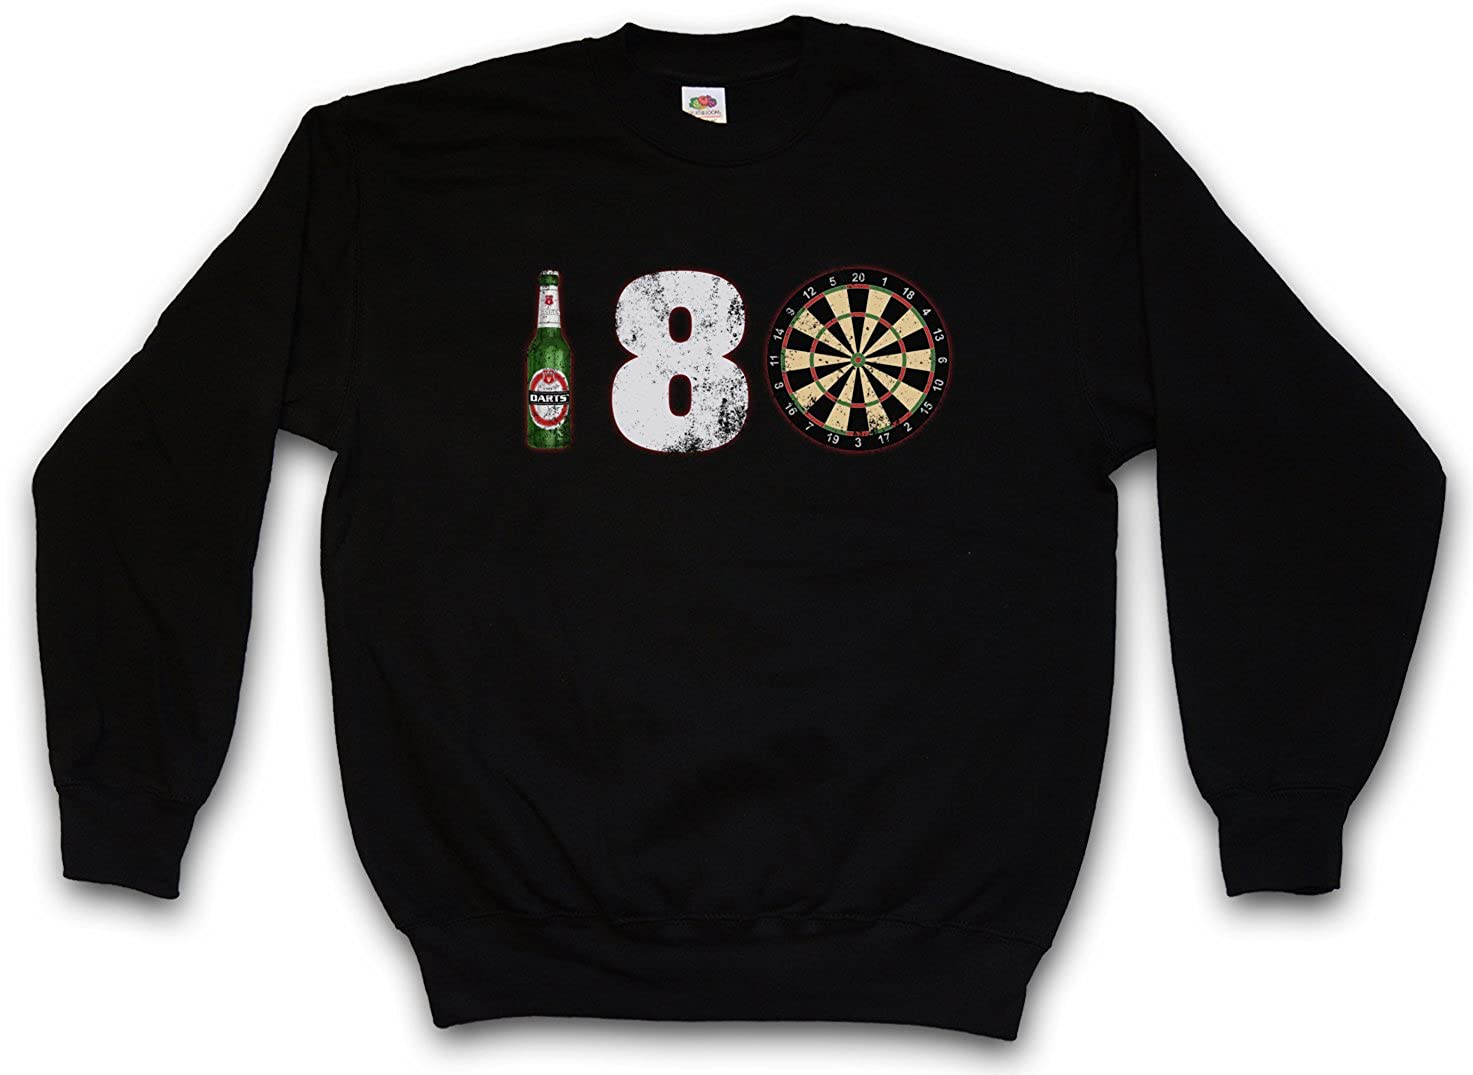 180 Darts Sweatshirt Pullover – – – Dart Arrows Dart Target Zielscheibe Pfeile Profi Shirt Größen S – 3XL B01CYUVHQY Sweatshirts Neuankömmling 72e233